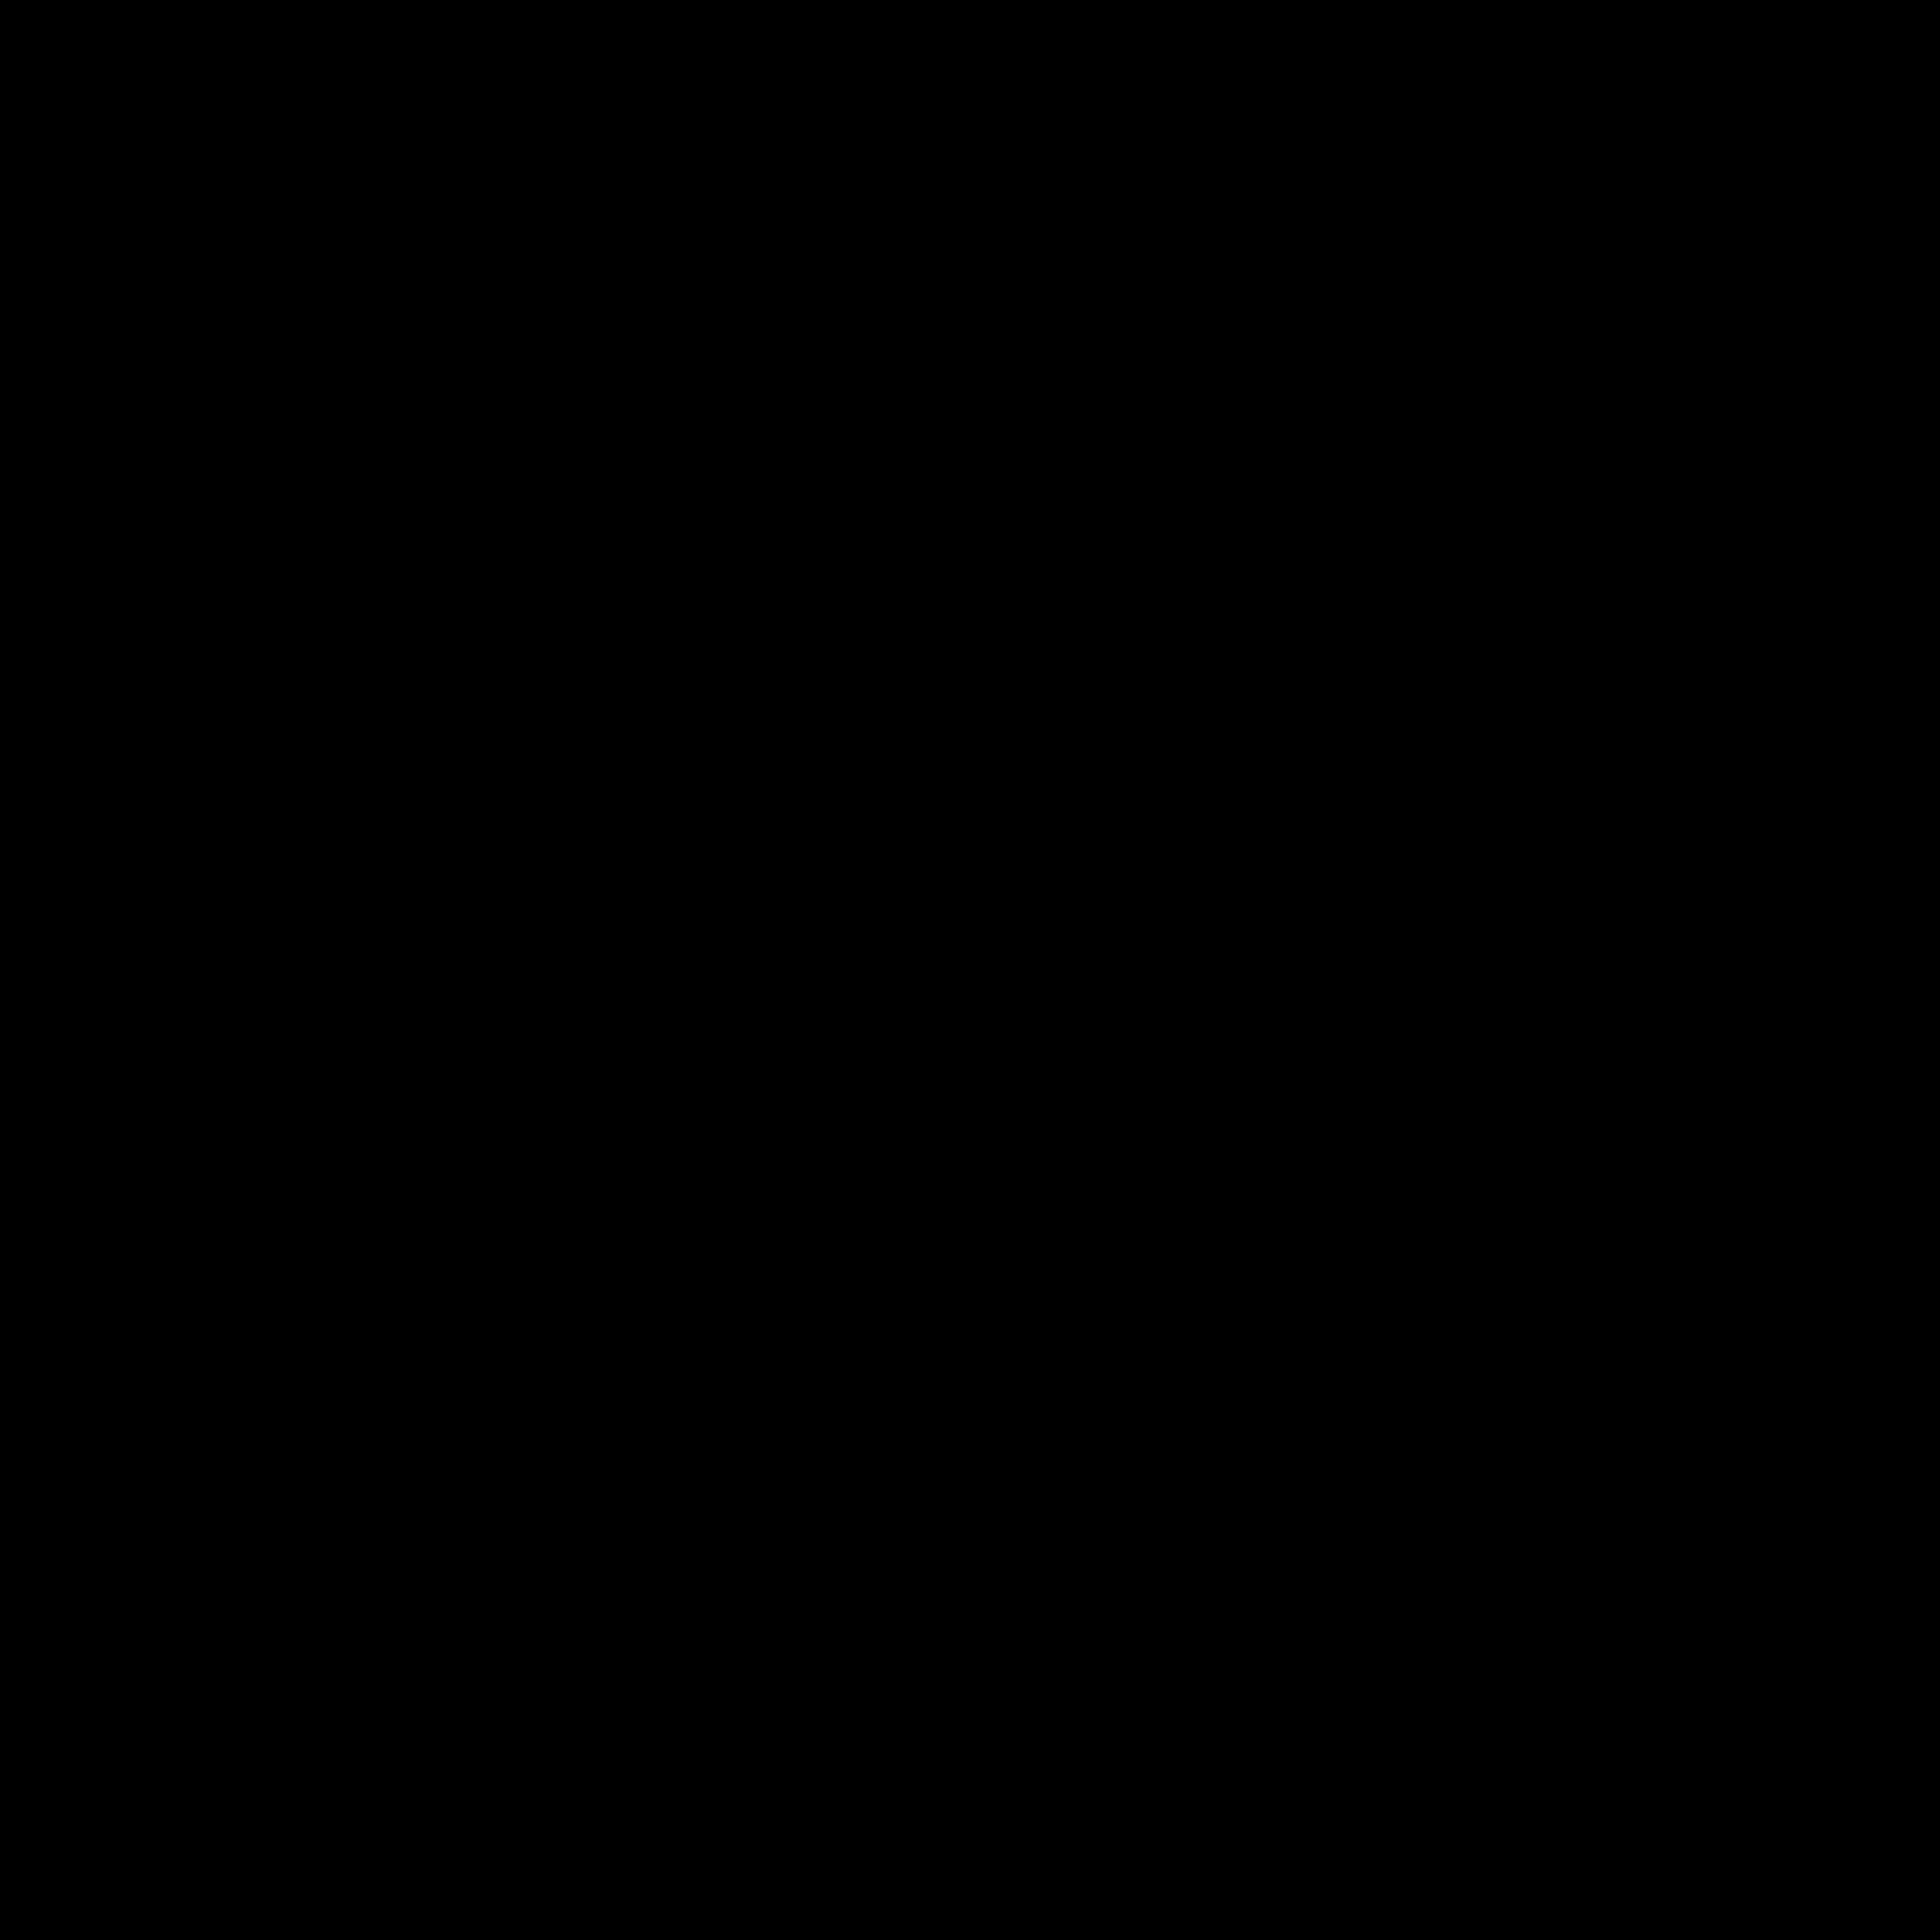 Caliper Clipart Clipground